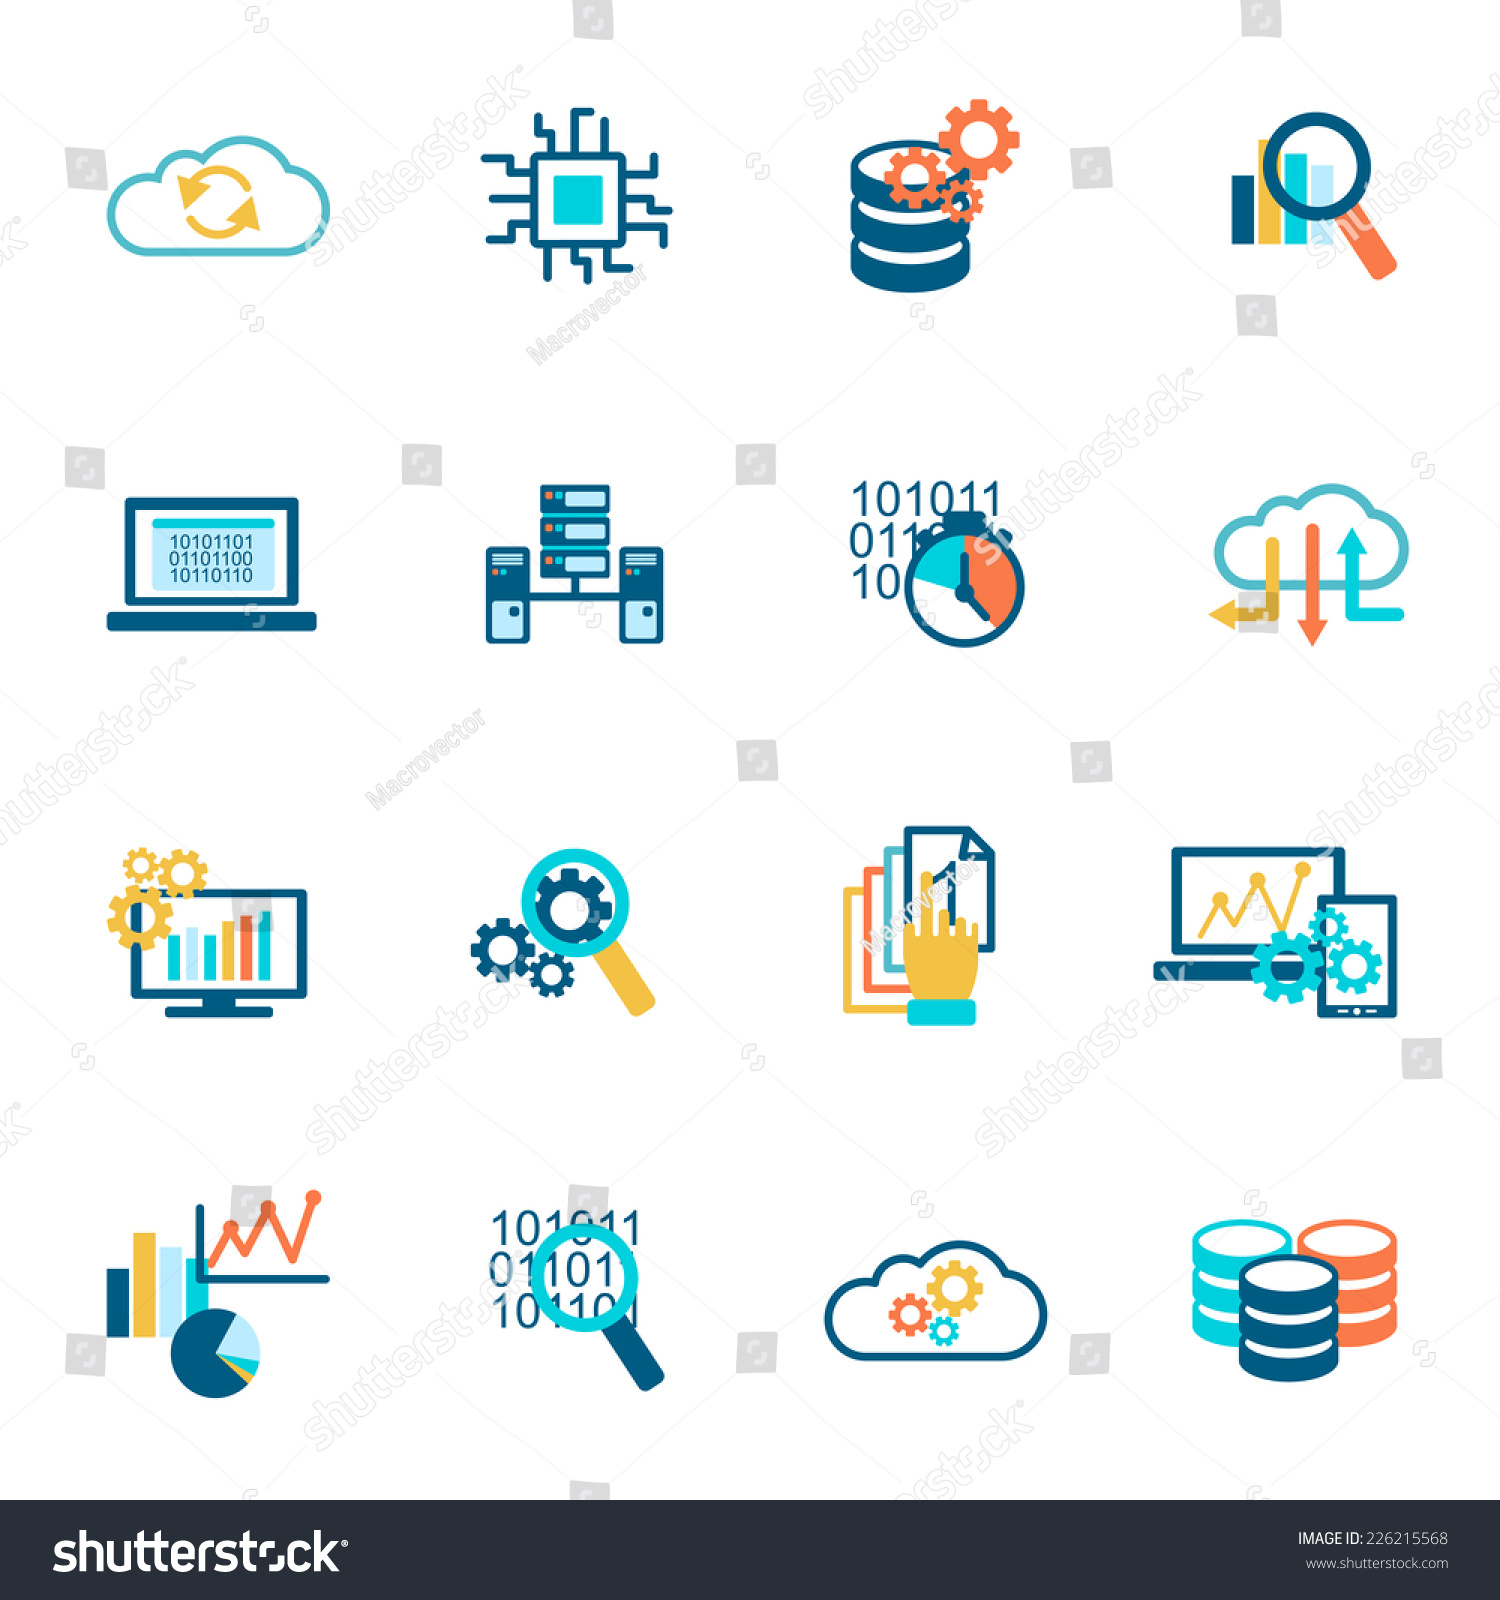 Database analytics information technology network management icons ...